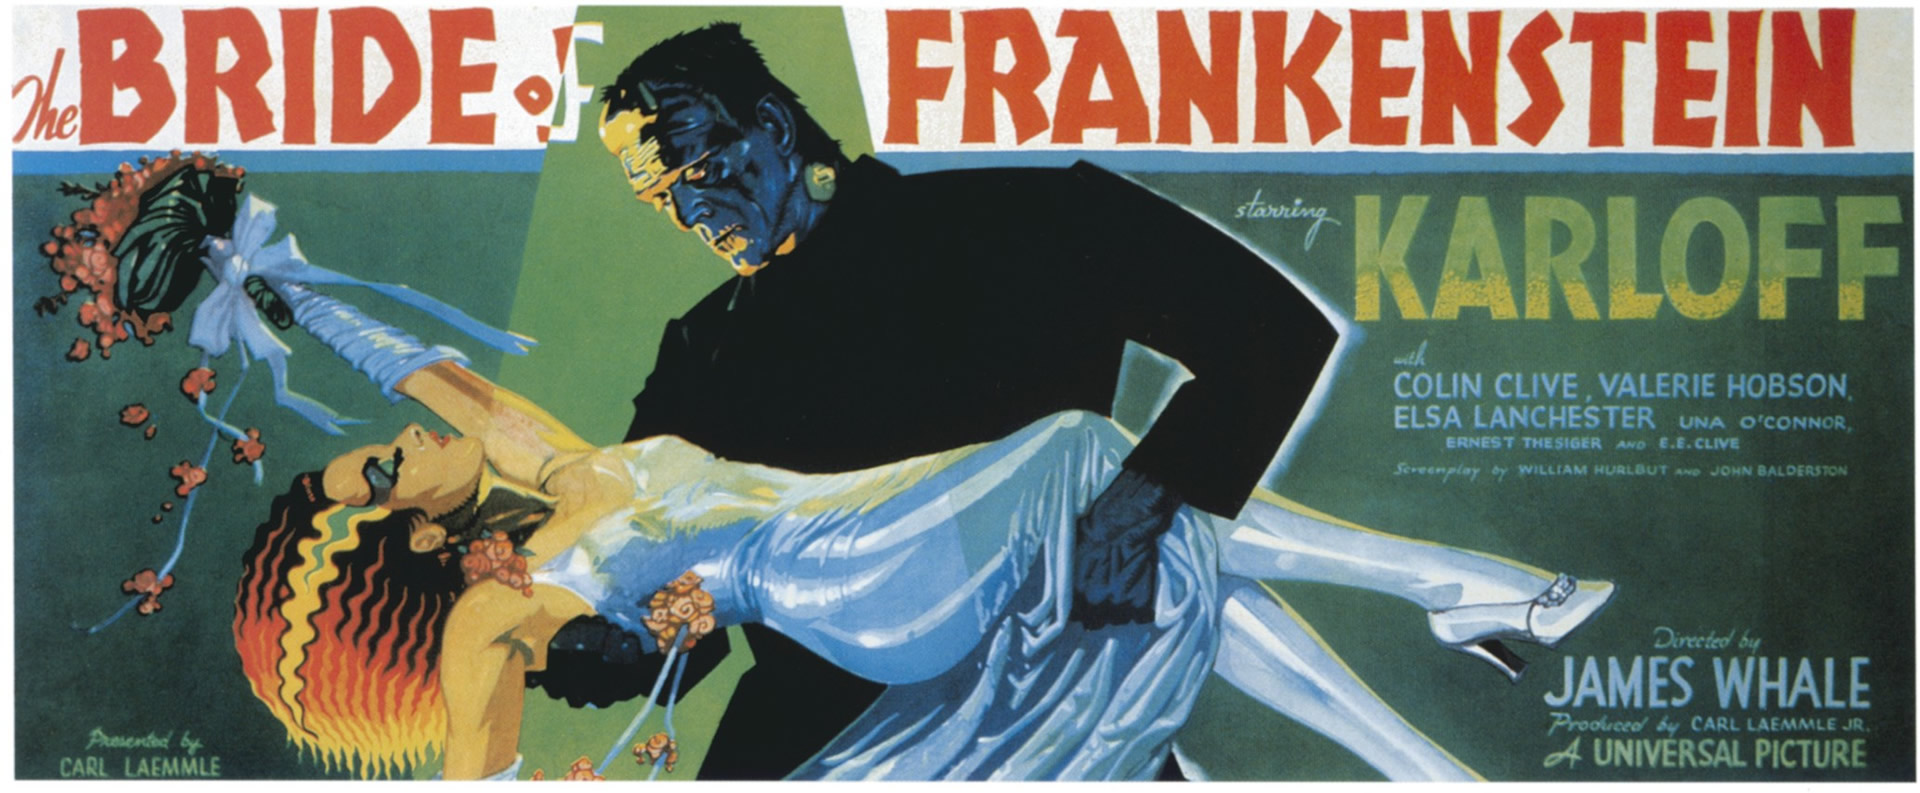 The Bride Of Frankenstein Landscape   Vintage 1930s Movie Posters 1920x793